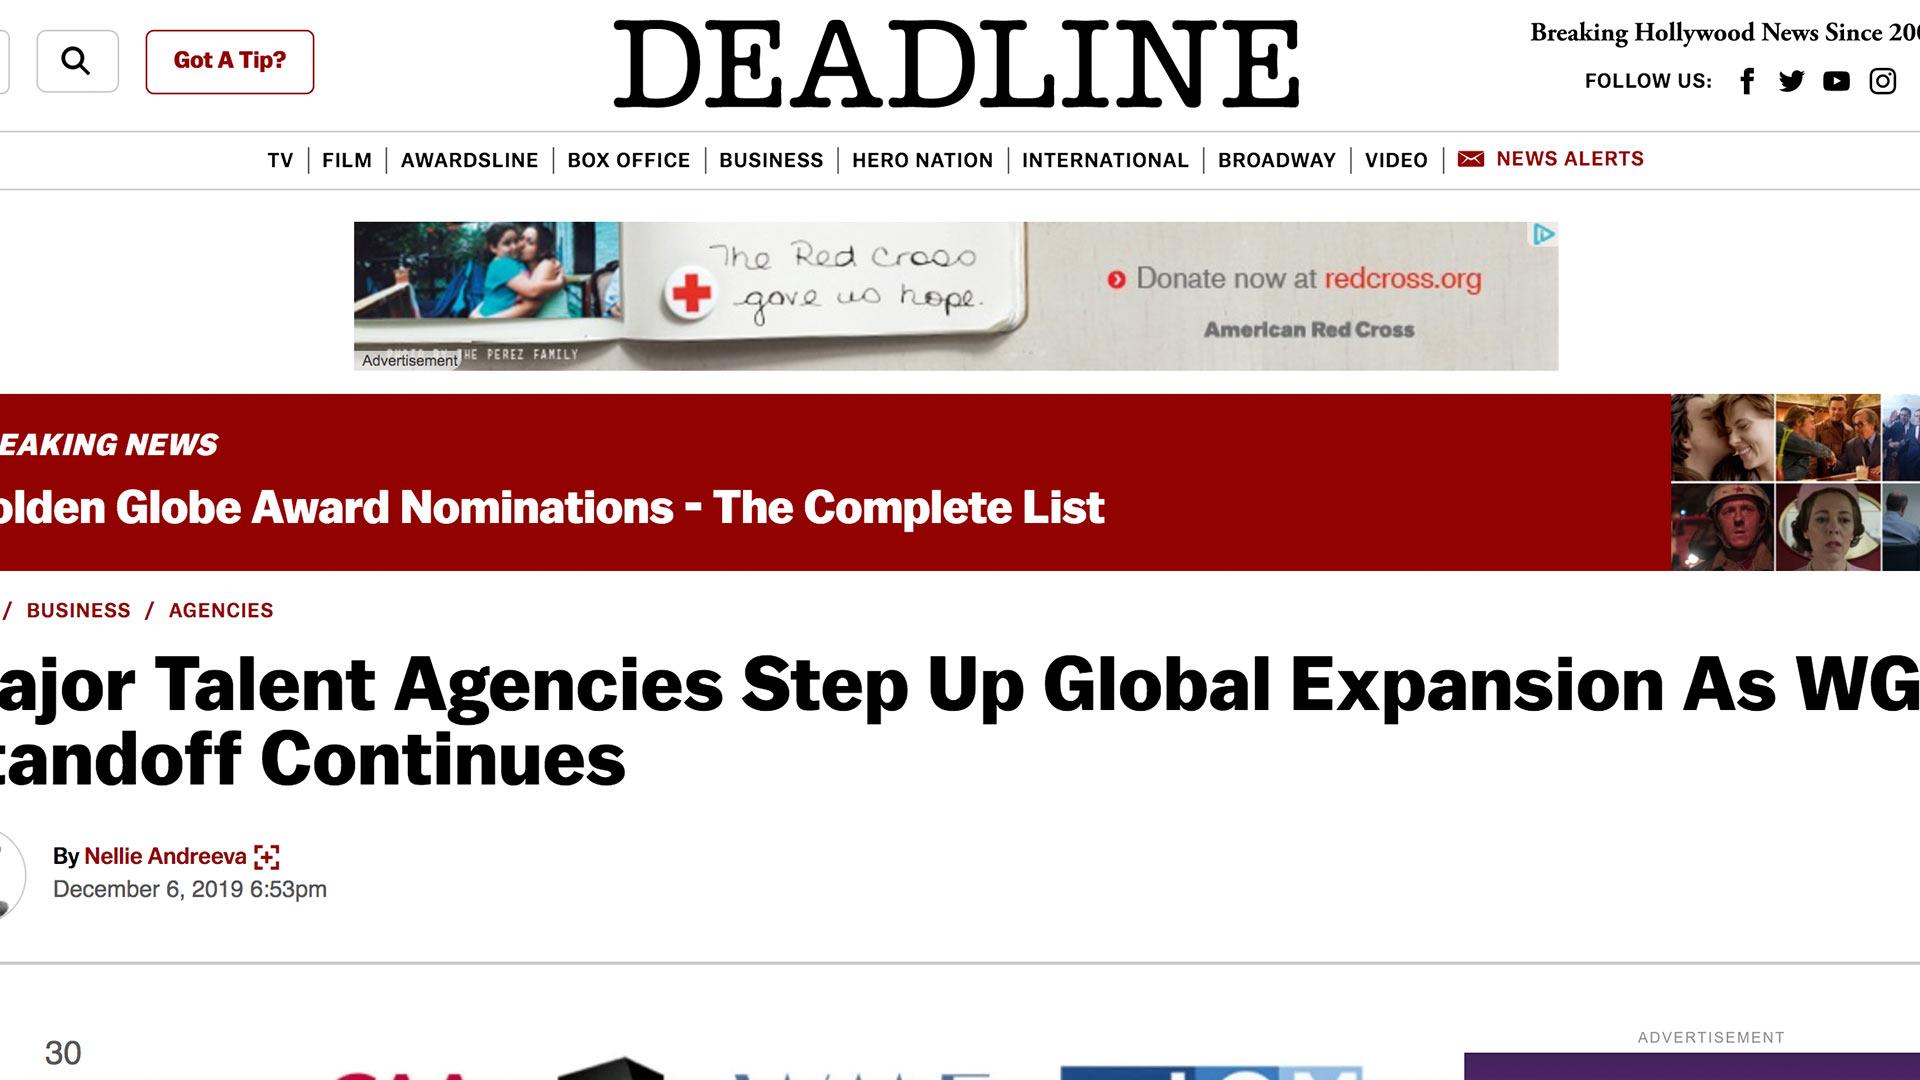 Fairness Rocks News Major Talent Agencies Step Up Global Expansion As WGA Standoff Continues